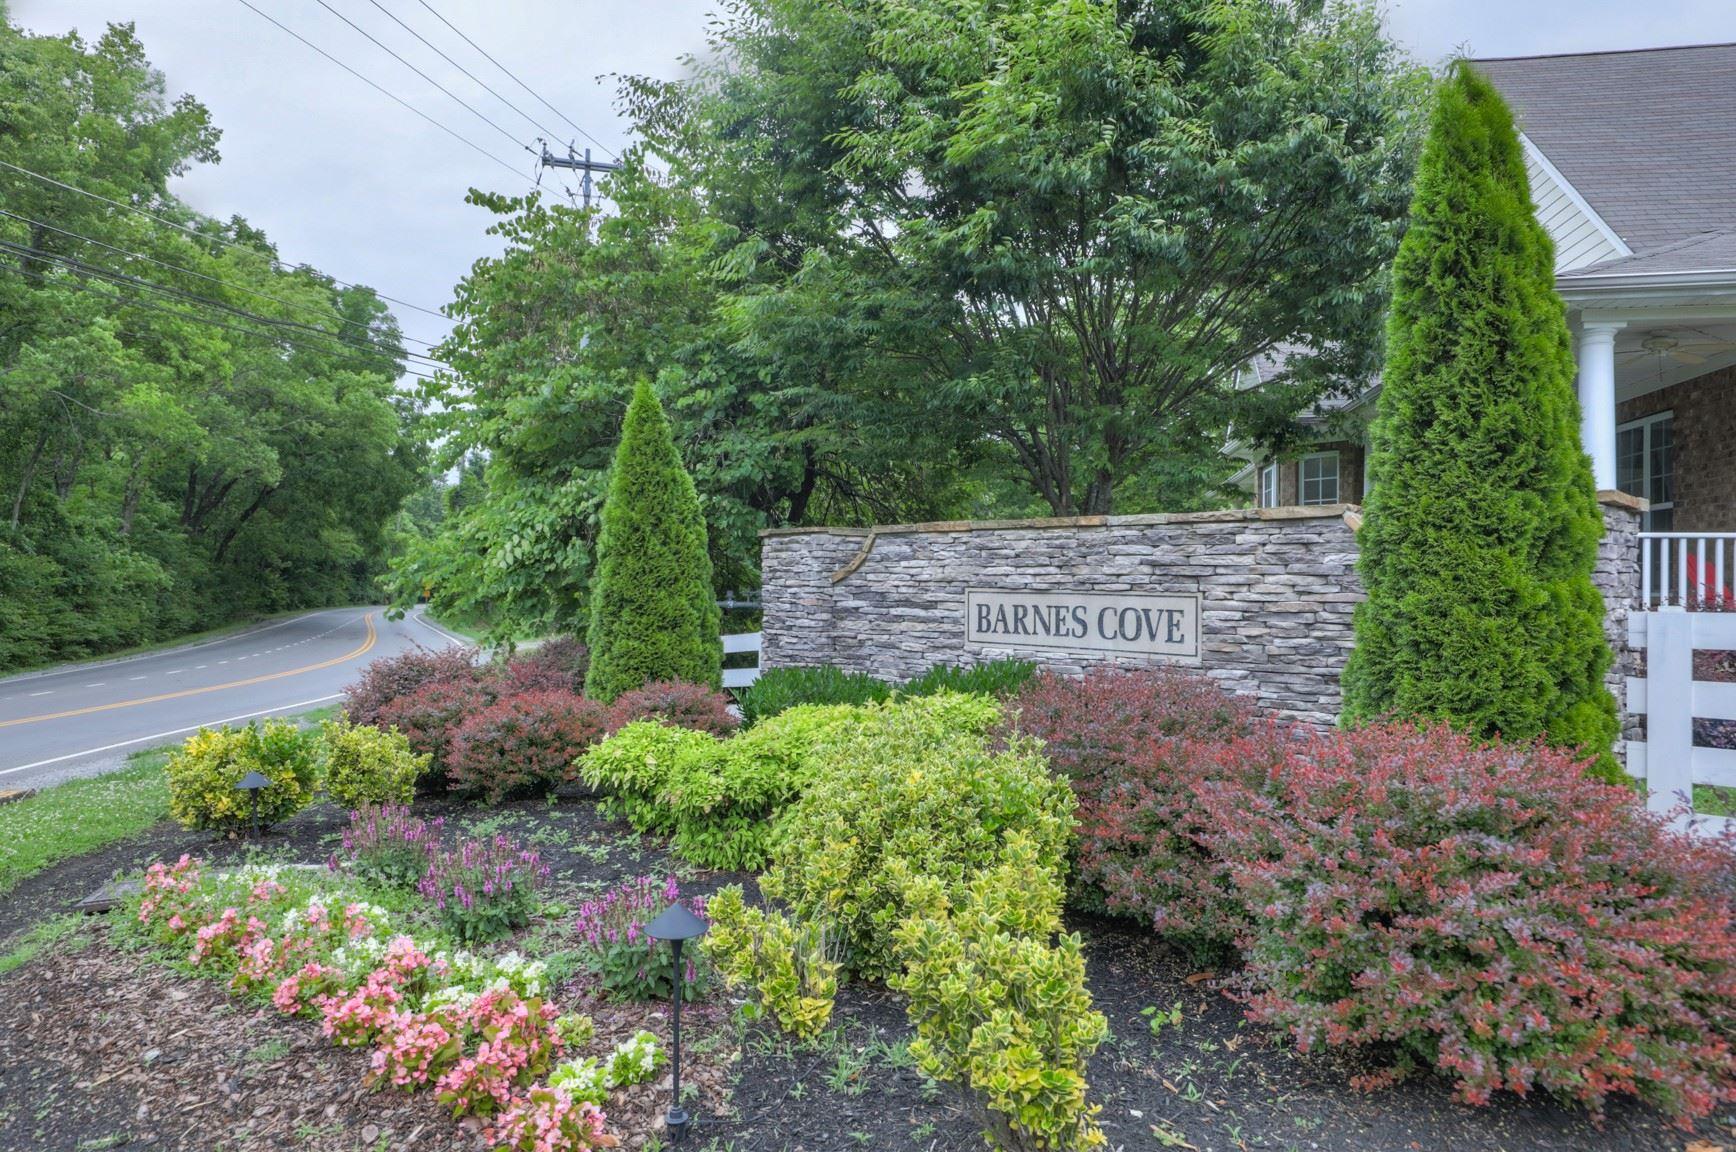 4032 Barnes Cove Dr, Antioch, TN 37013 - MLS#: 2159152